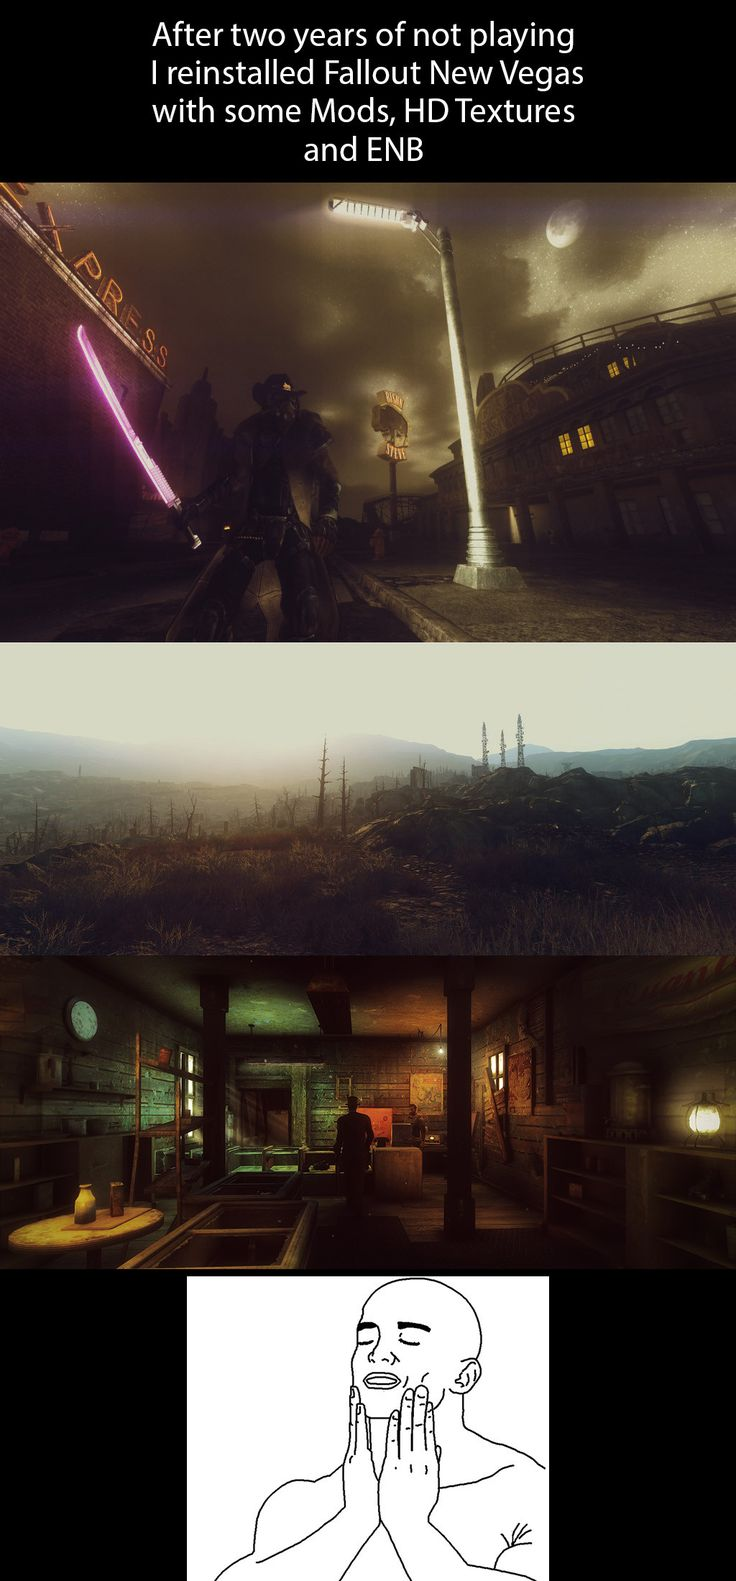 Just reinstalled Fallout New Vegas!